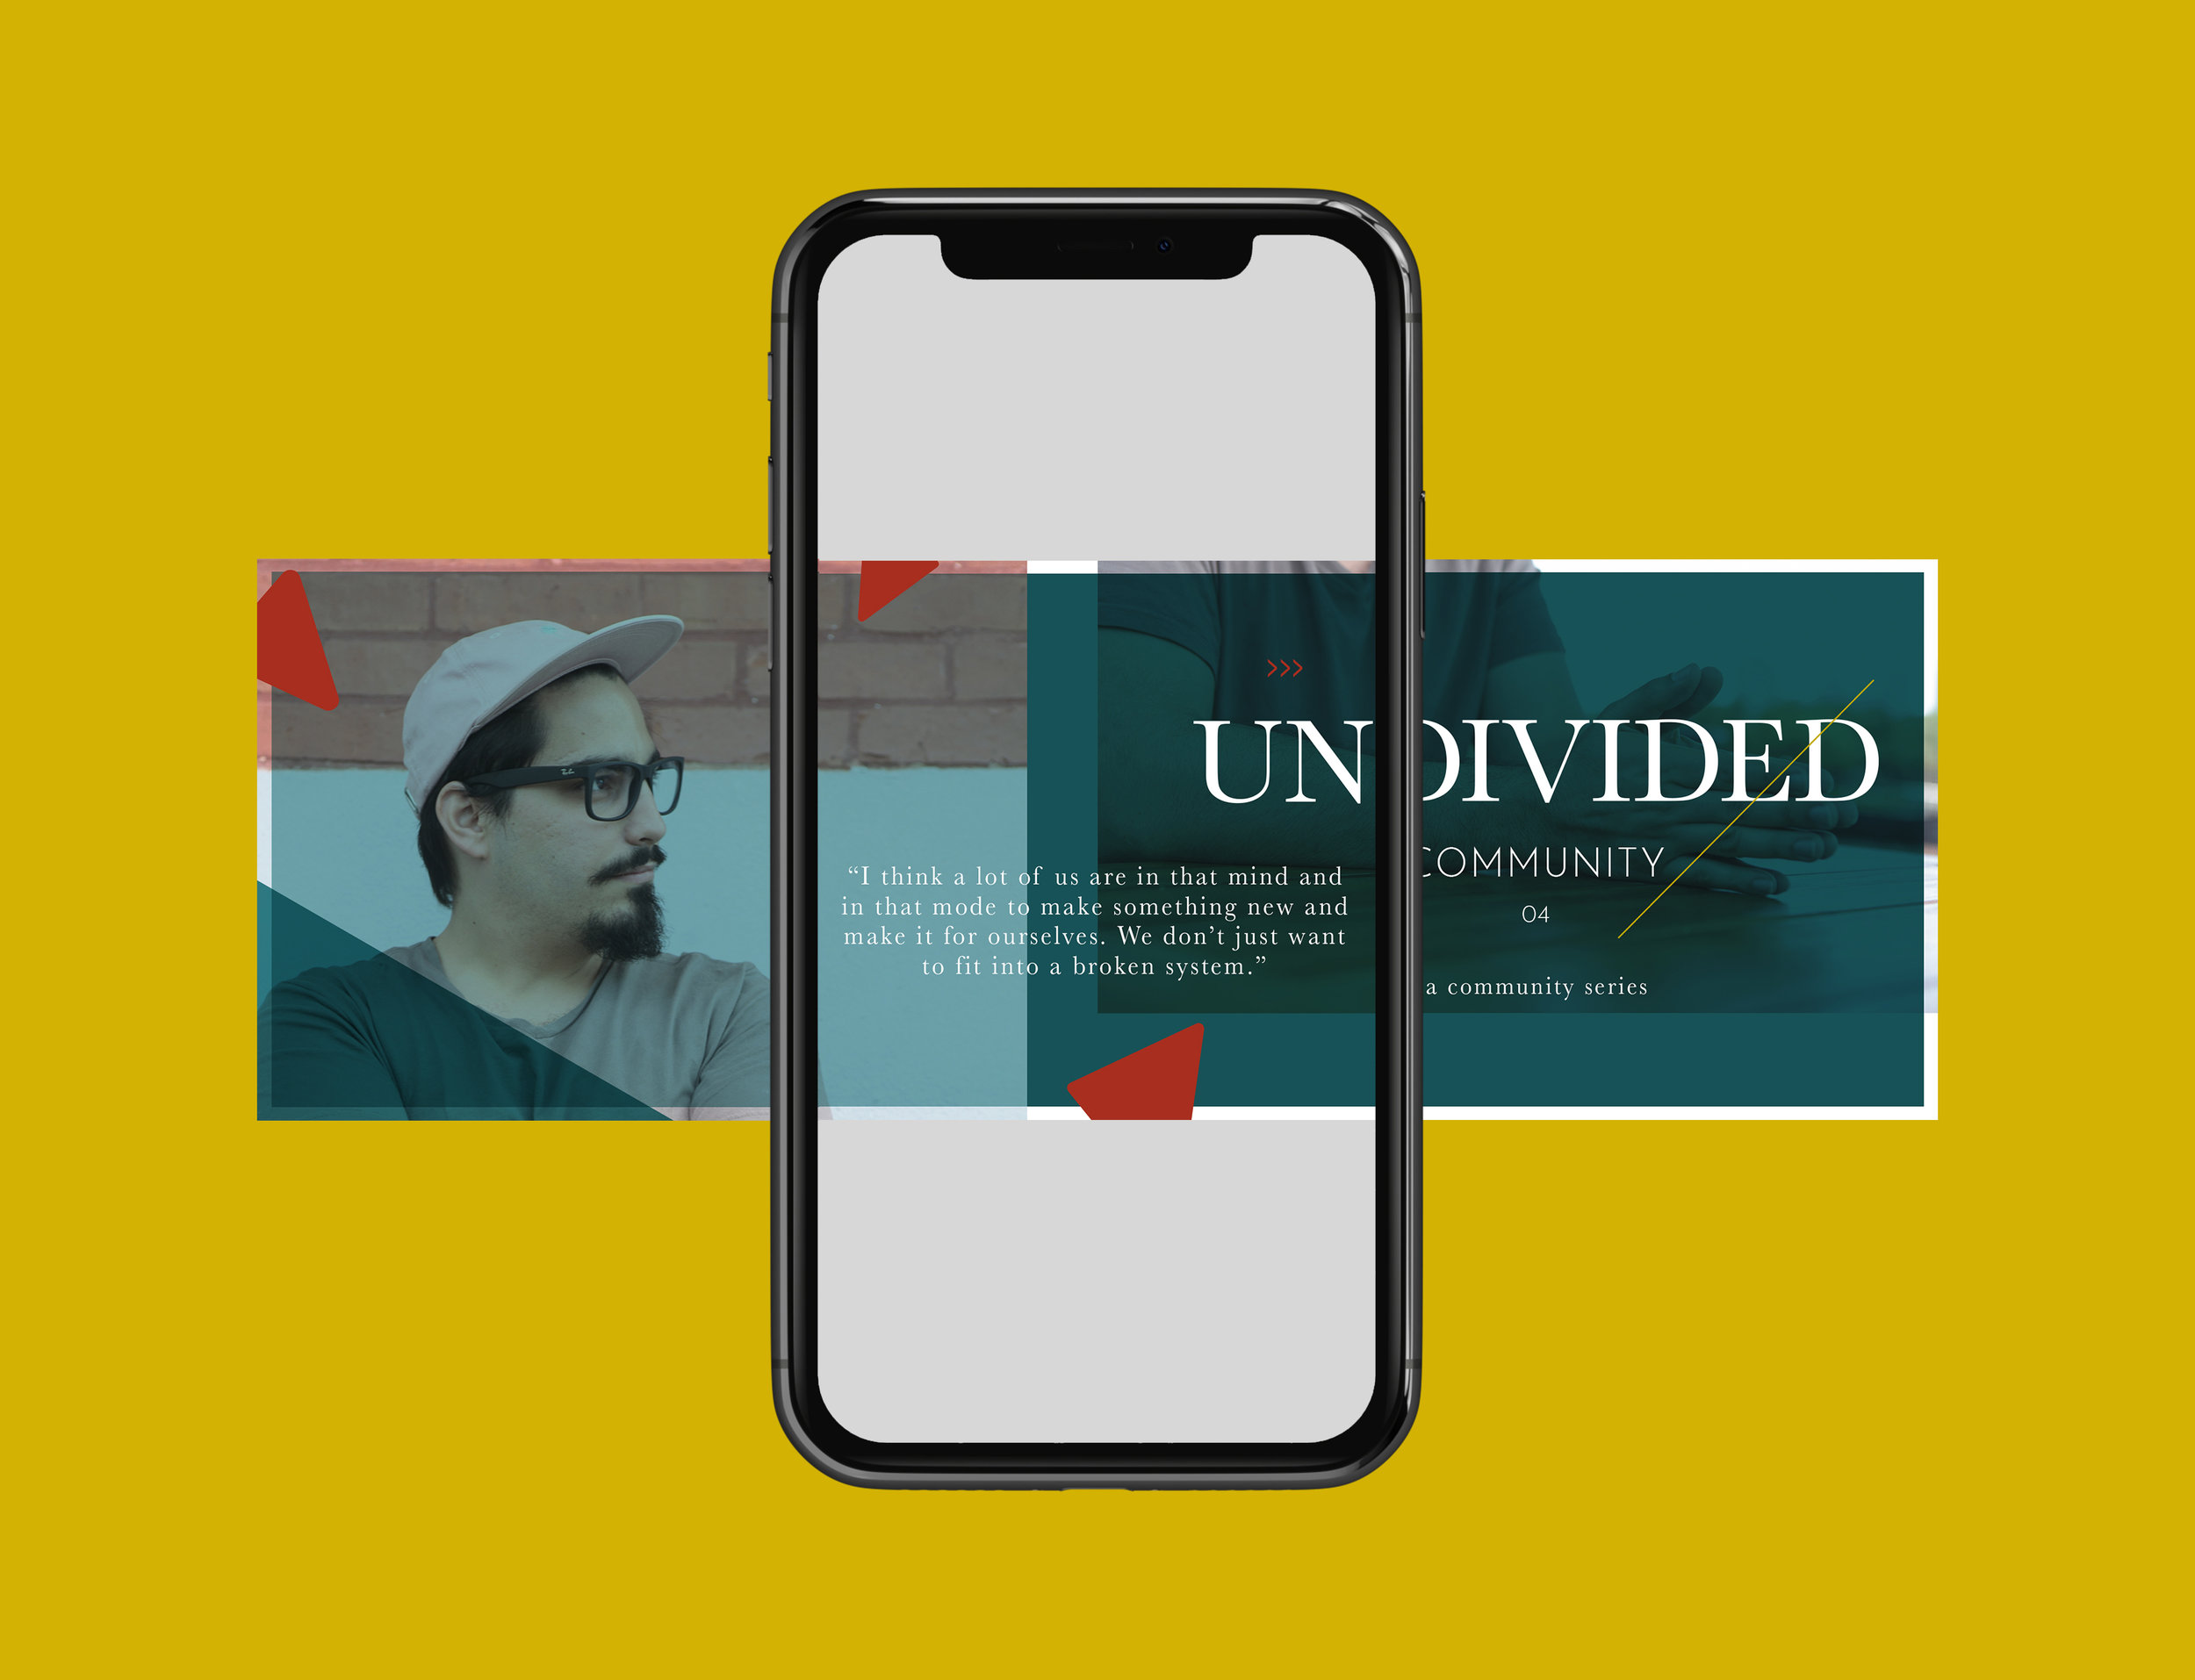 Undivided-Community4.jpg